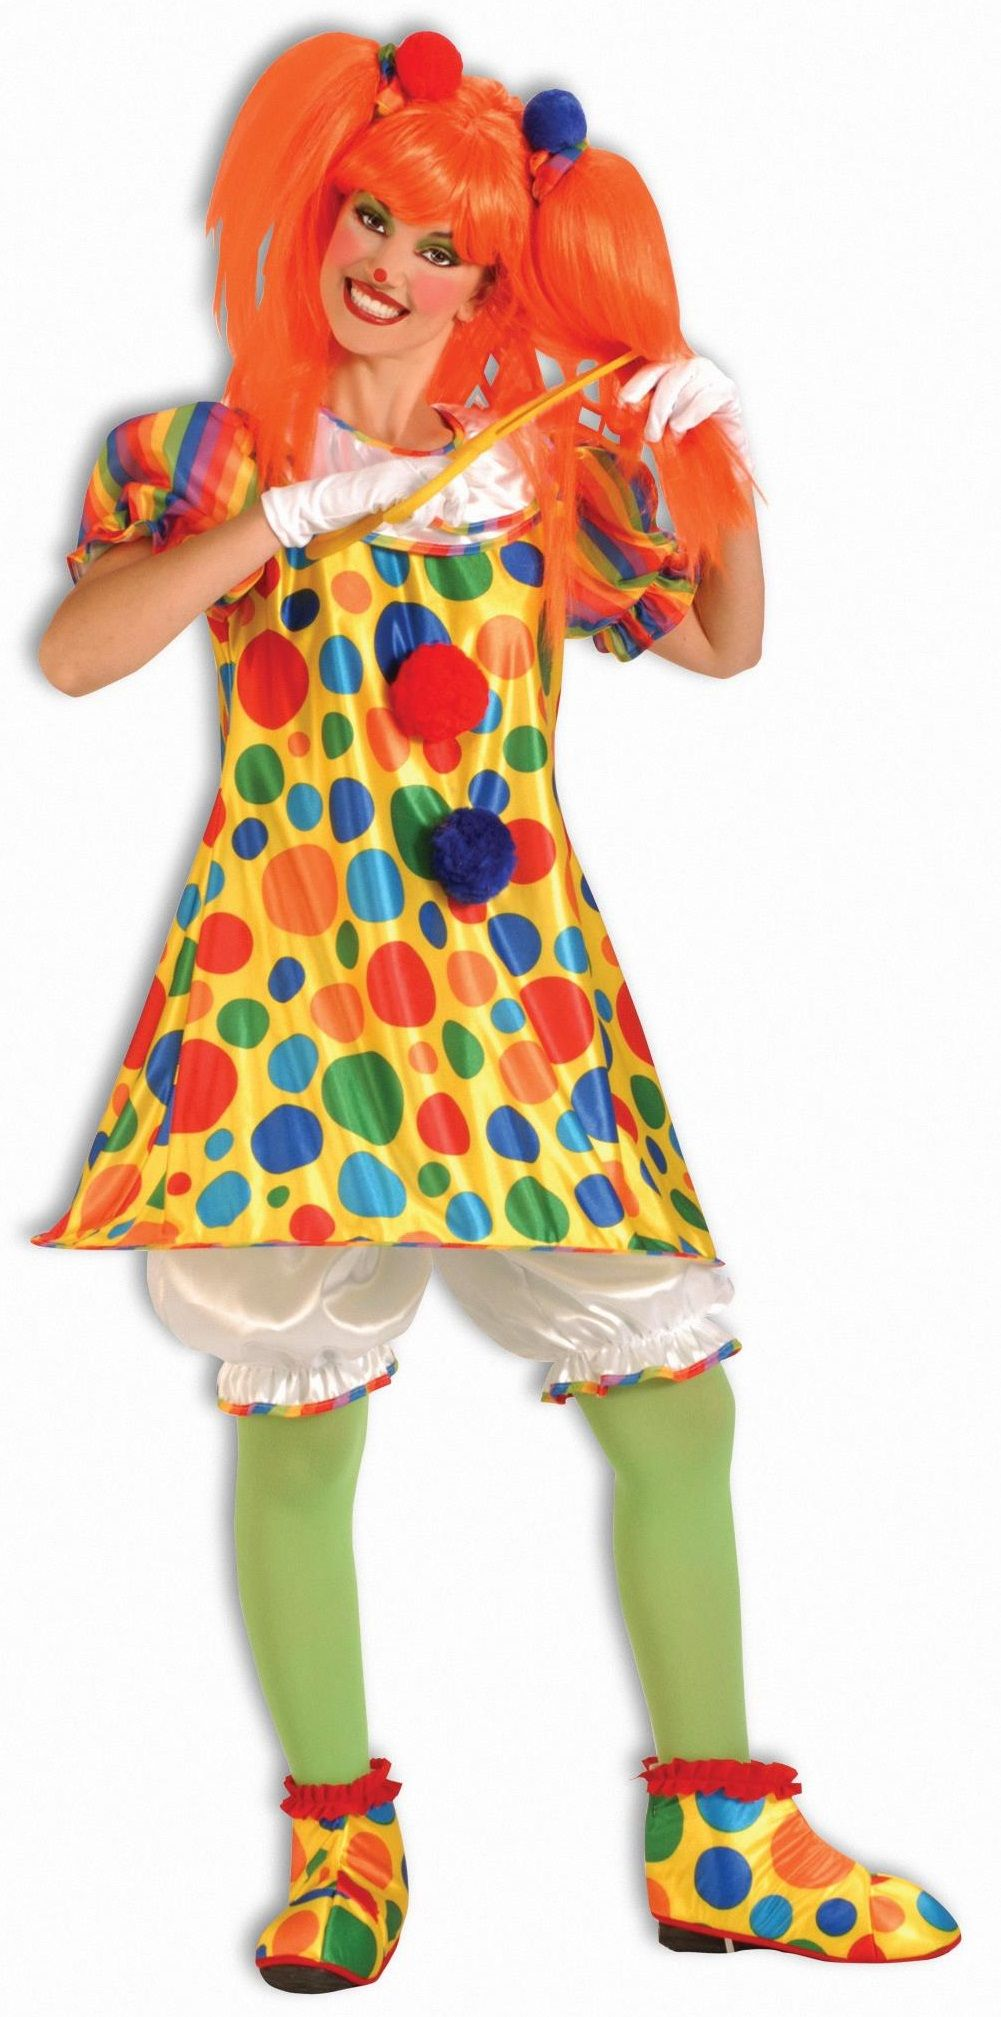 Plus Size Giggles the Clown Costume Calgary, Alberta. A